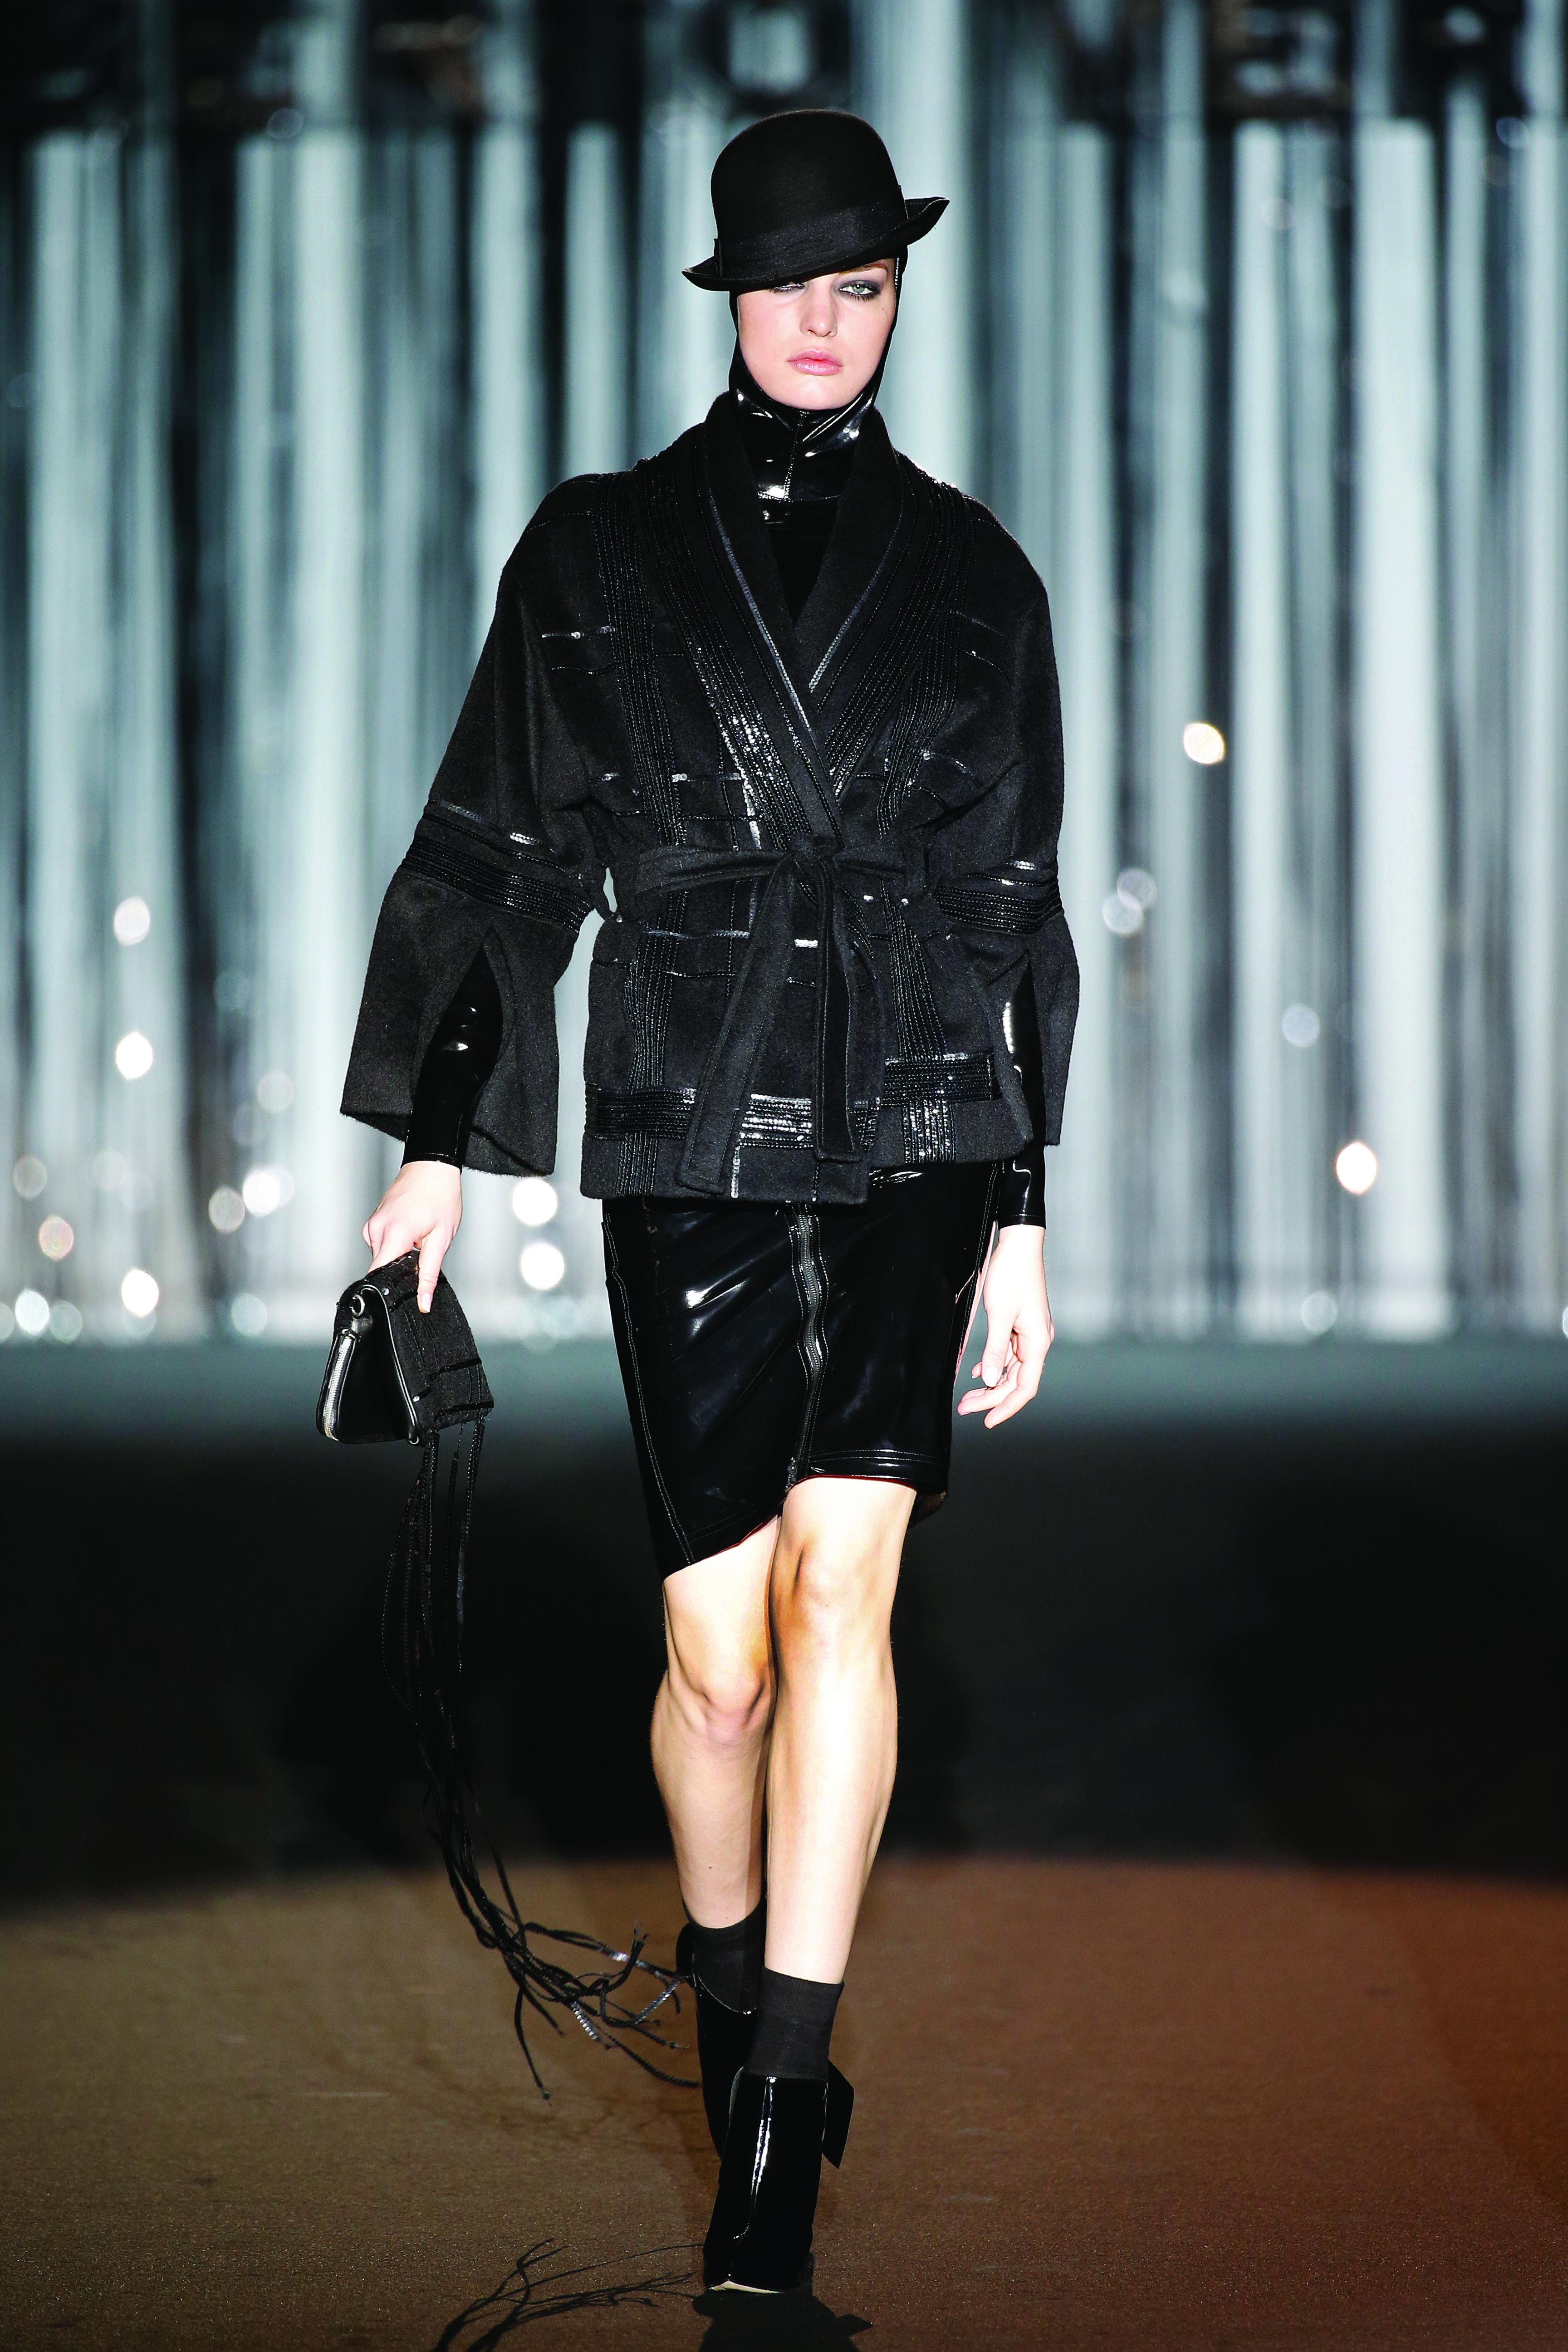 roberto verino madrid mercedes benz fashion week automne hiver 2015 luxsure. Black Bedroom Furniture Sets. Home Design Ideas